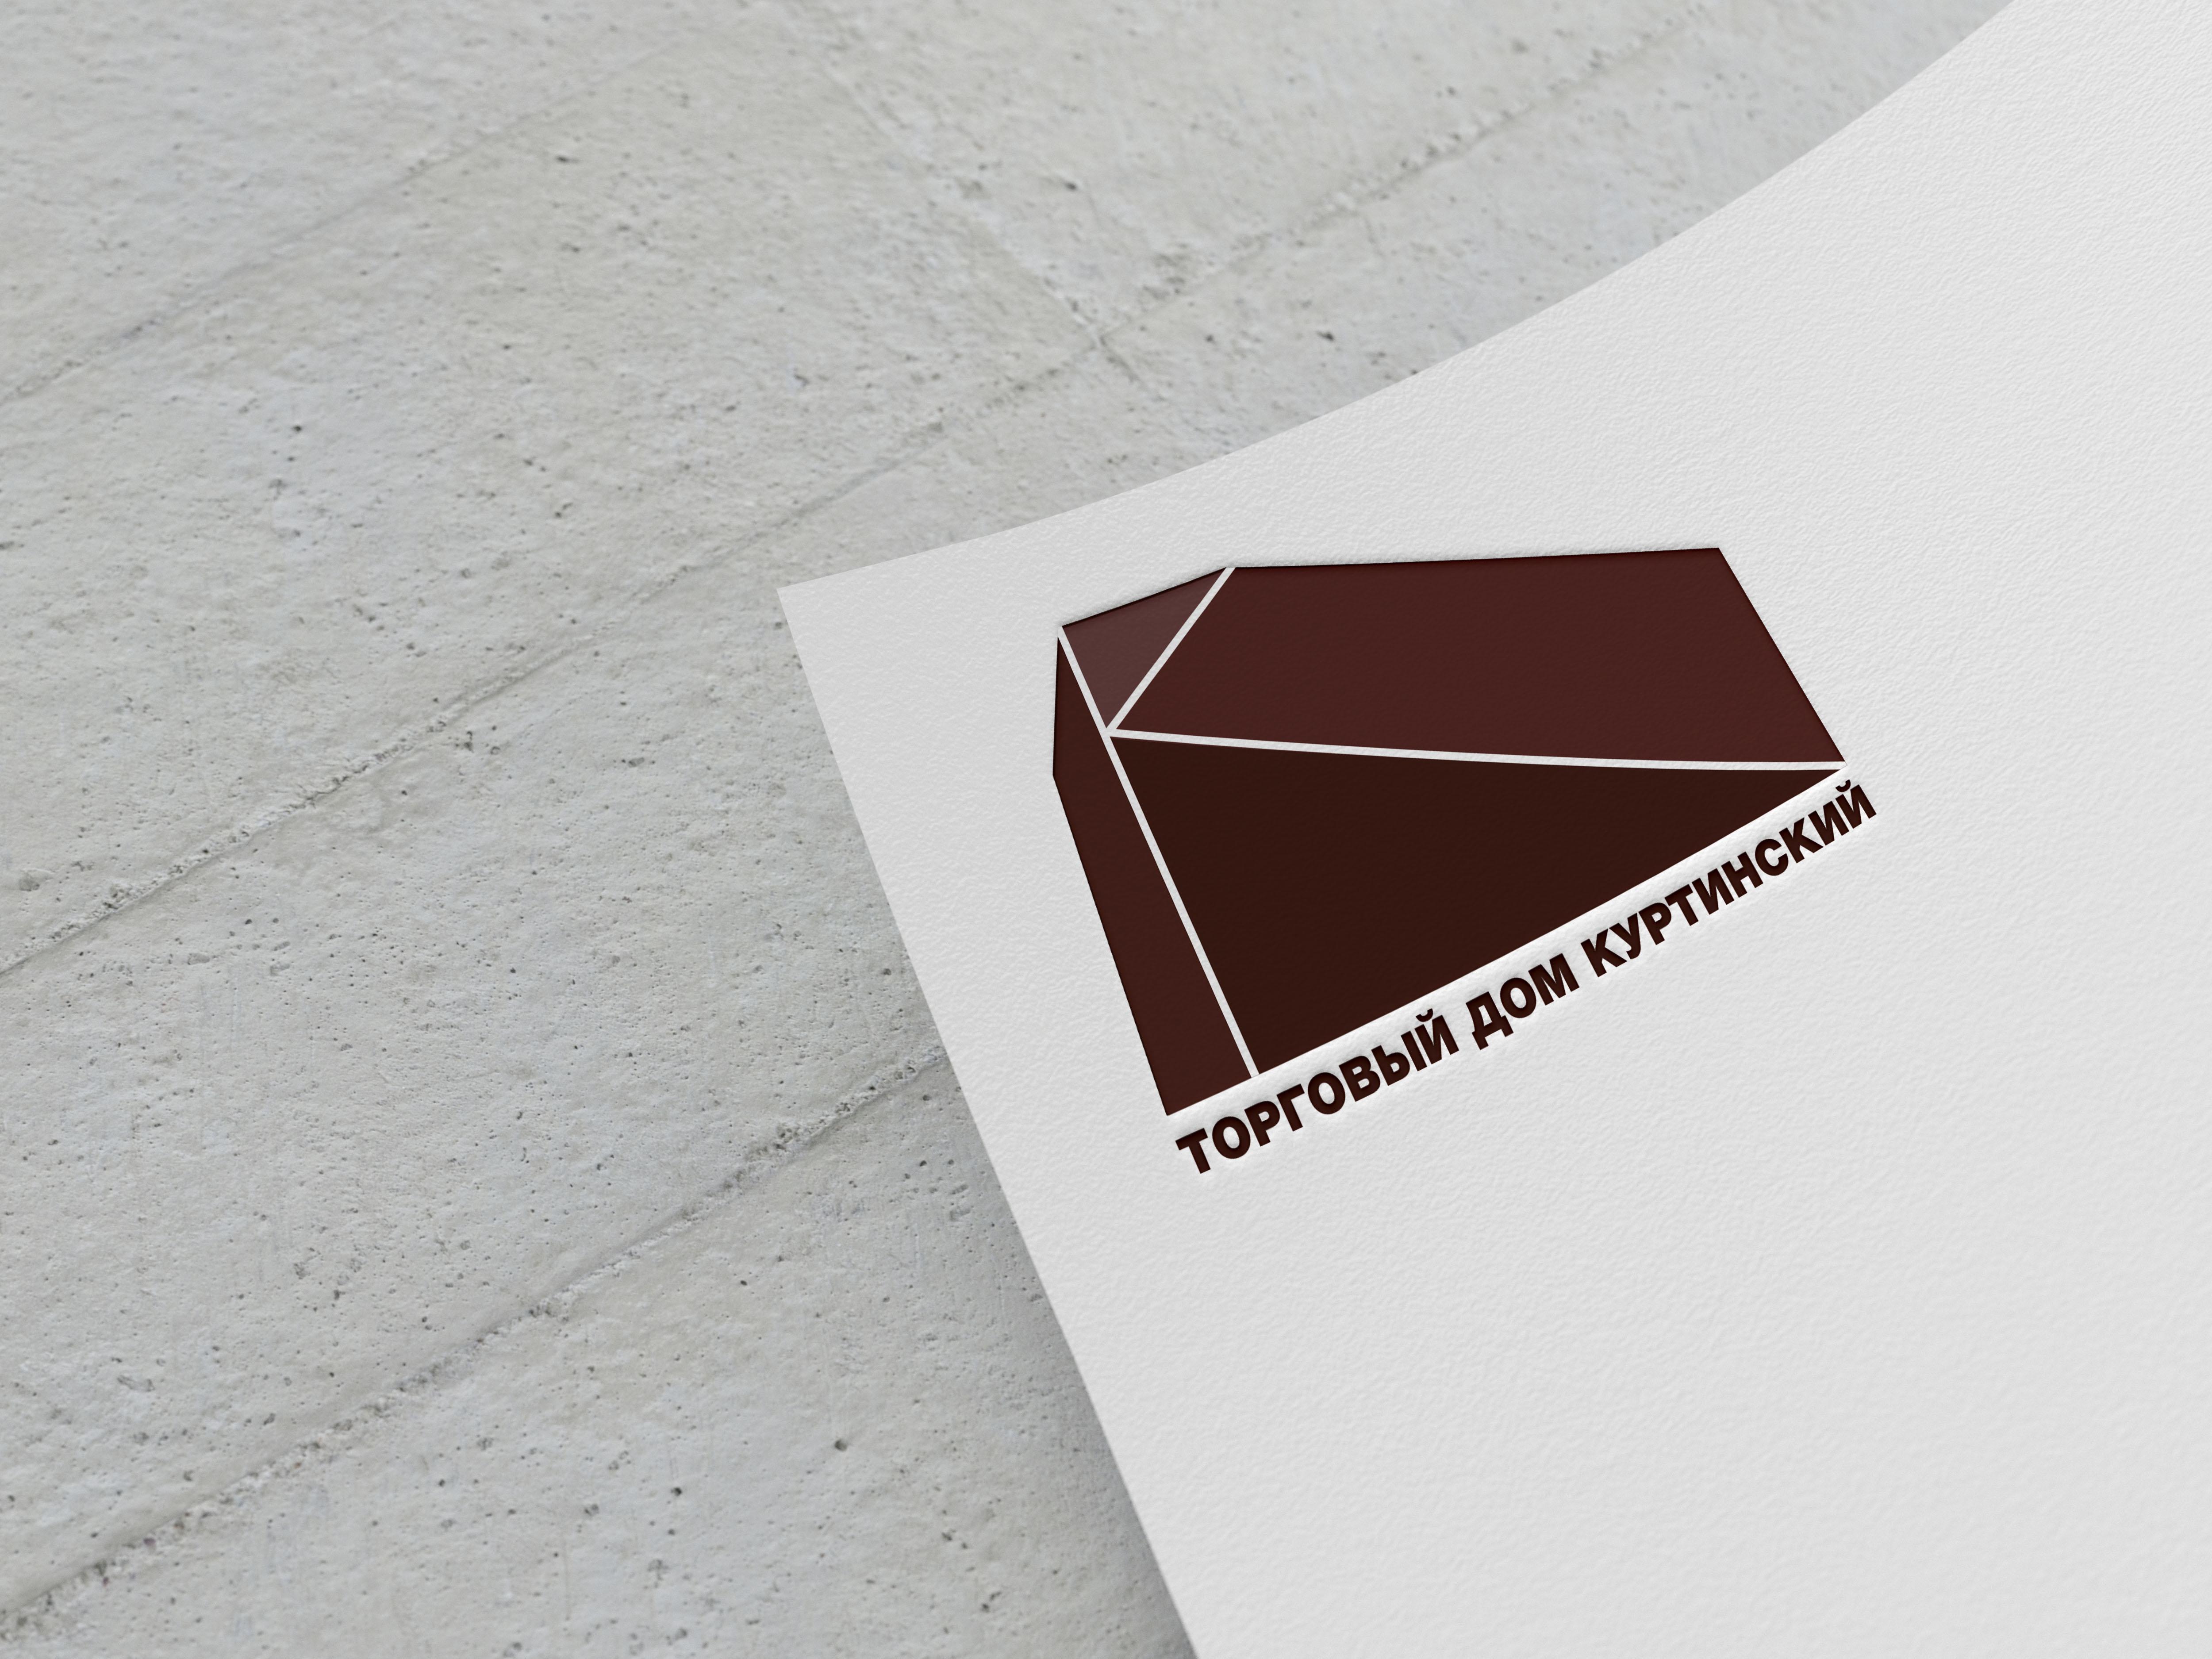 Логотип для камнедобывающей компании фото f_9065b9ac15b794a6.jpg